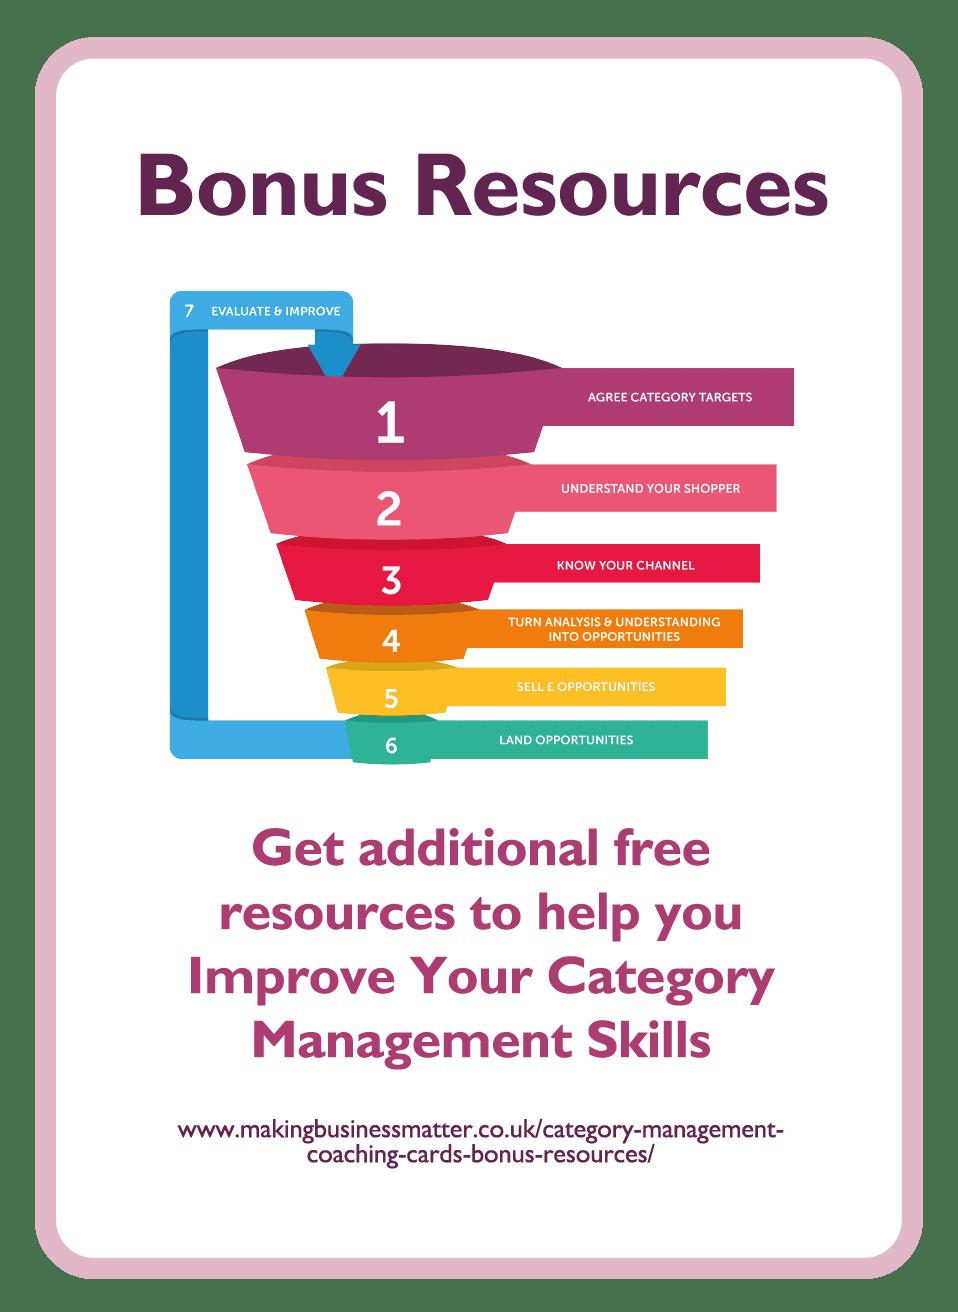 Category management coaching card titled Bonus Resources